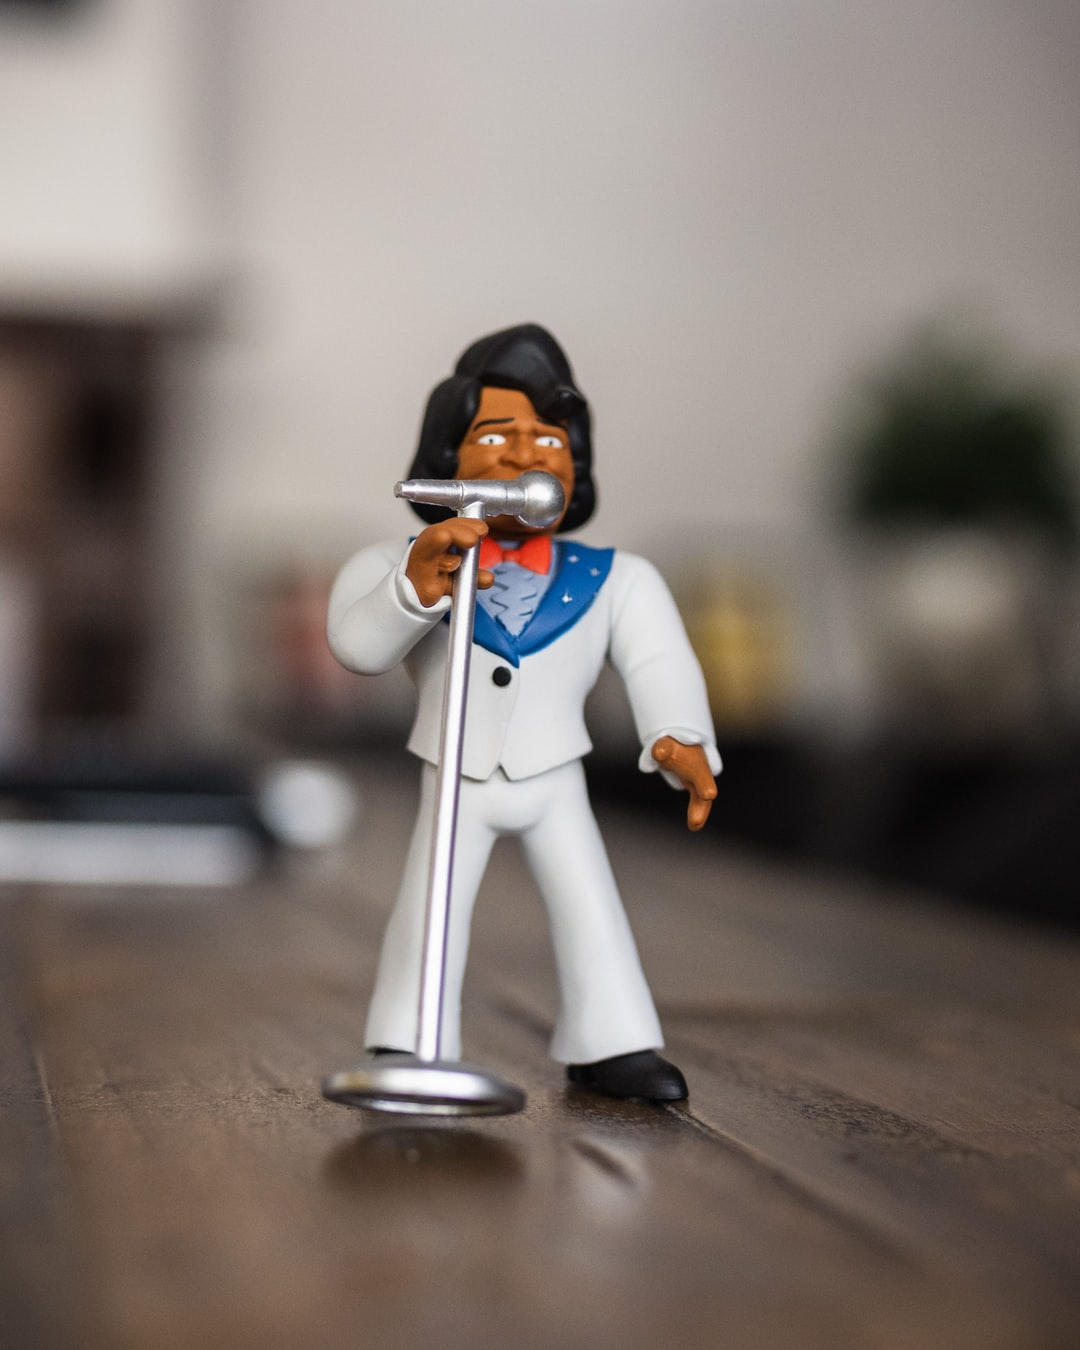 Music icon James Brown pop figurine singing